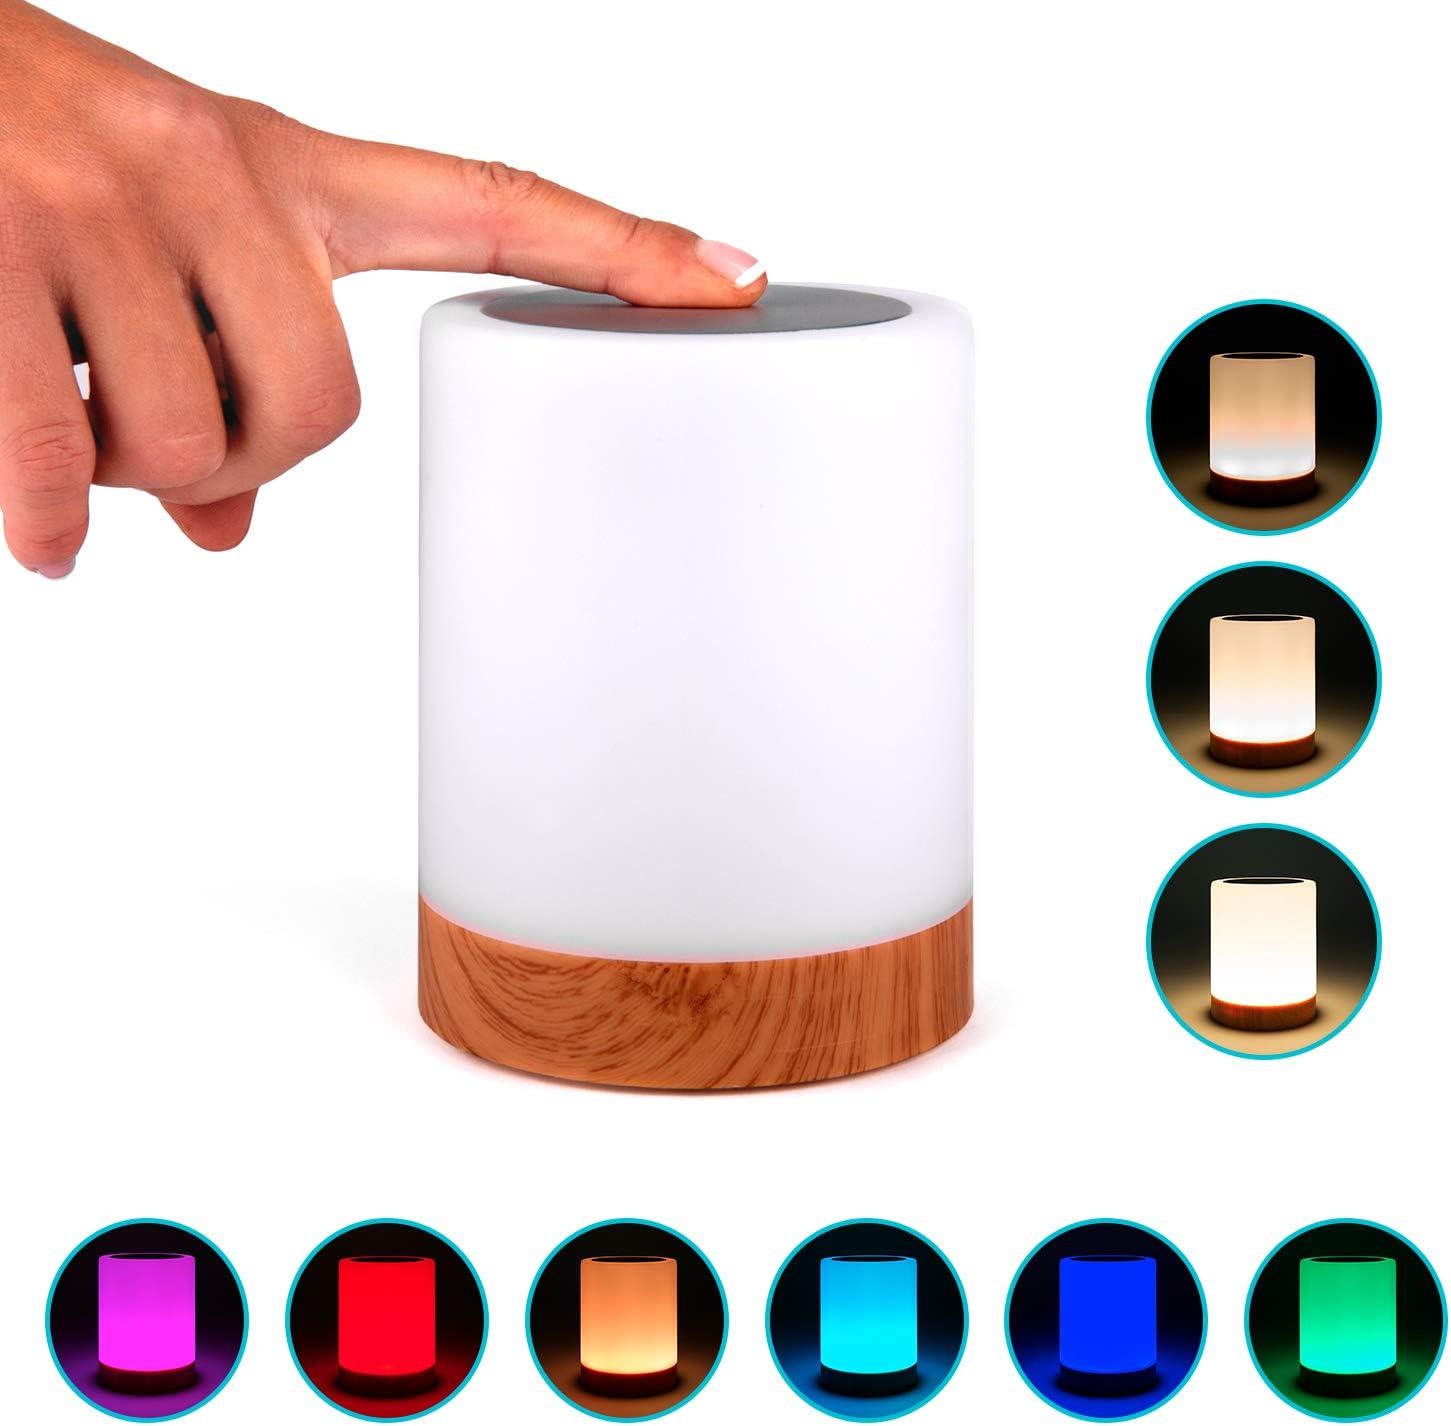 Lampara decorativa tactil con luz LED de colores para mesa ...